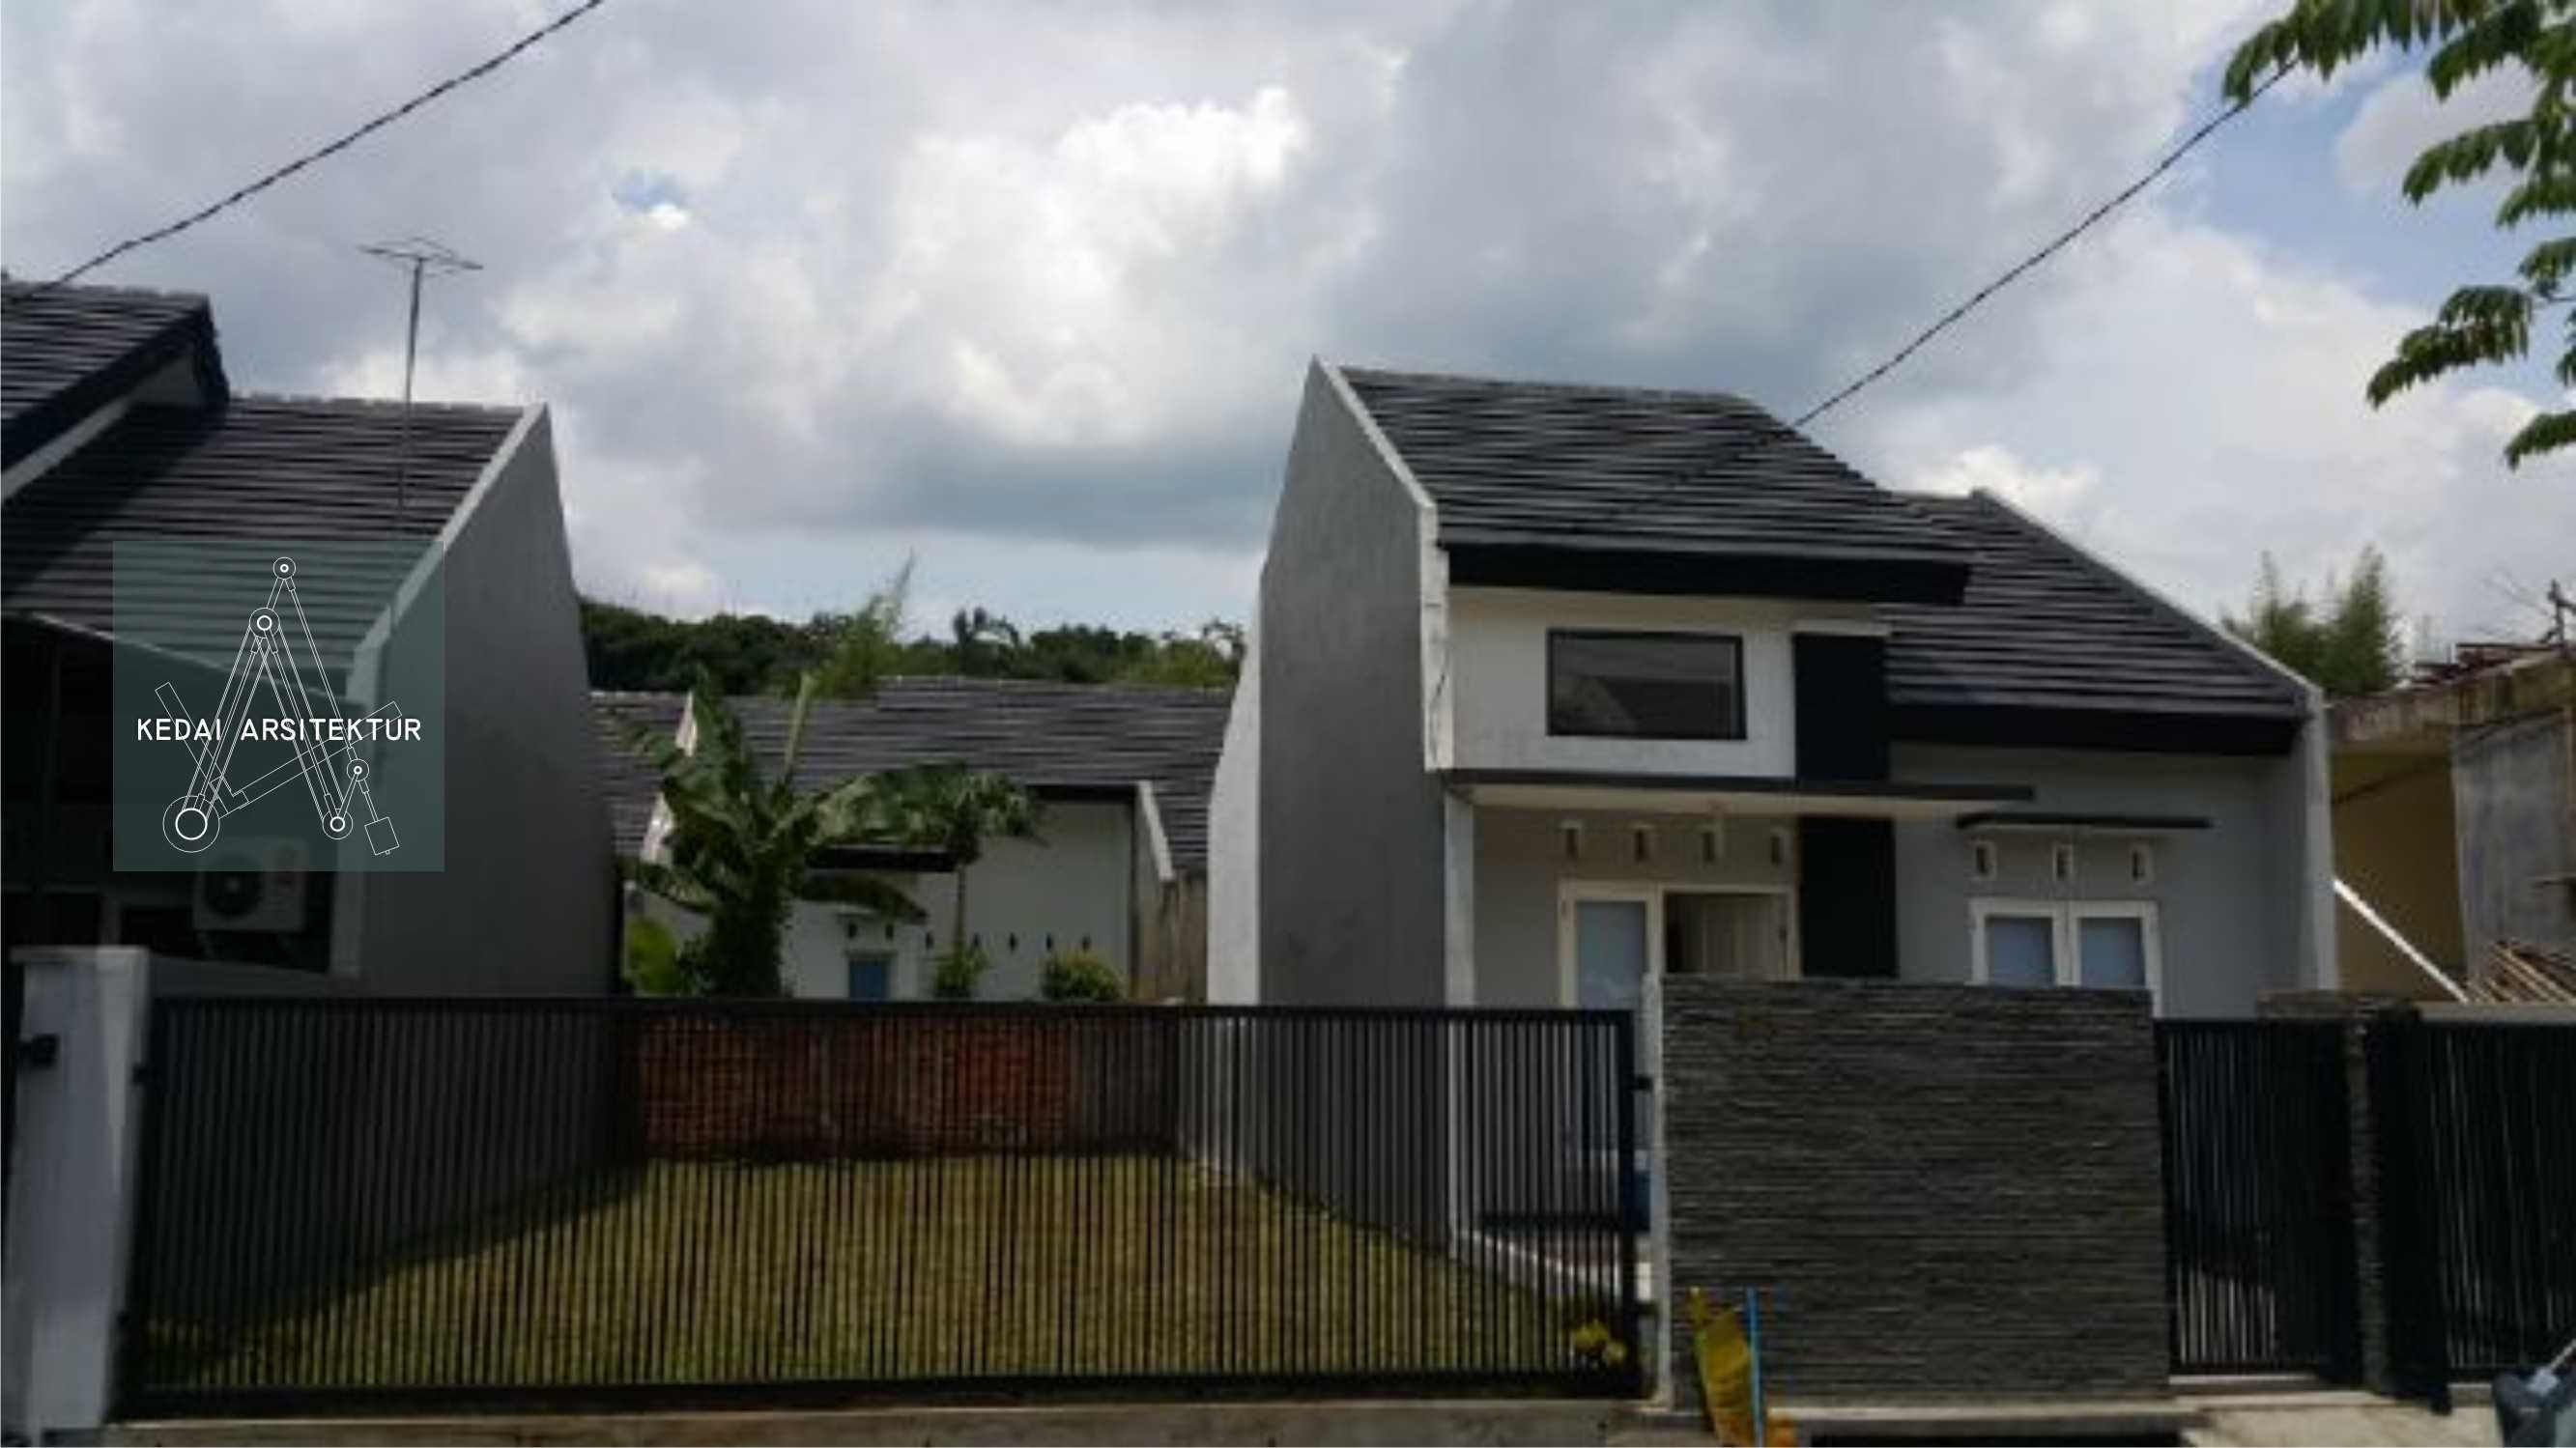 Kedai.arsitektur House In Cilebut Jl. Pendidikan 2, Cilebut, Cilebut Bar., Sukaraja, Bogor, Jawa Barat 16157, Indonesia  Rmh-Cilebut-Existing Modern  35884